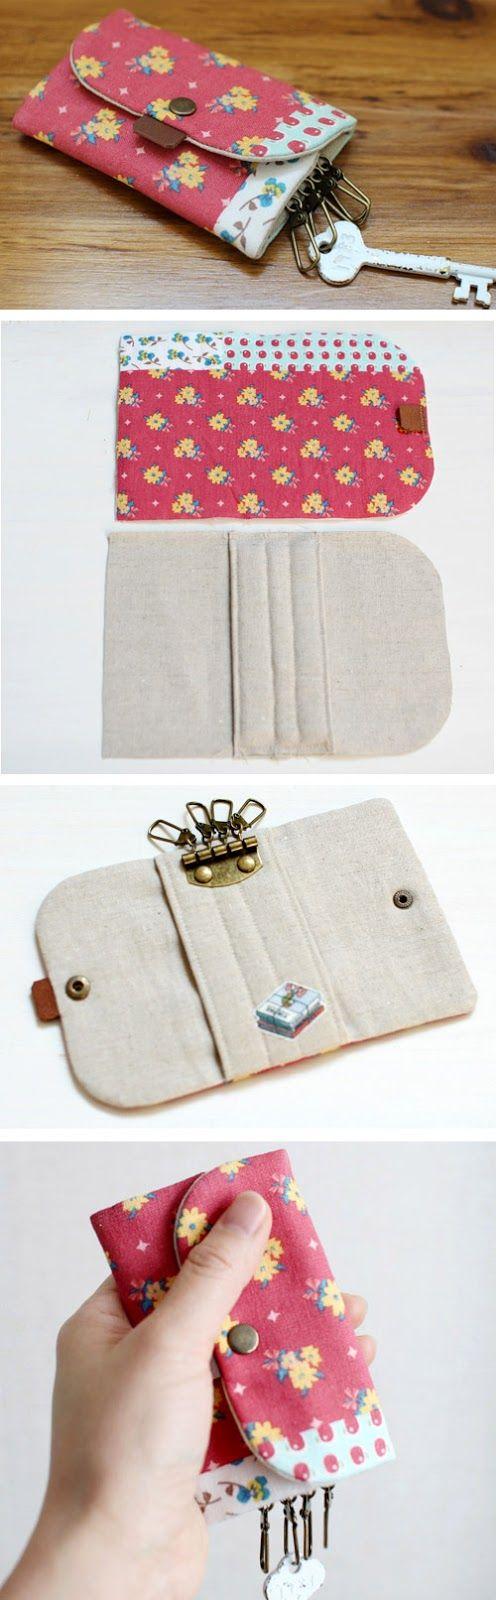 Key Chain Bag Holder Tutorial Diy Leather Bag Diy Bags Holder Sewing Bag